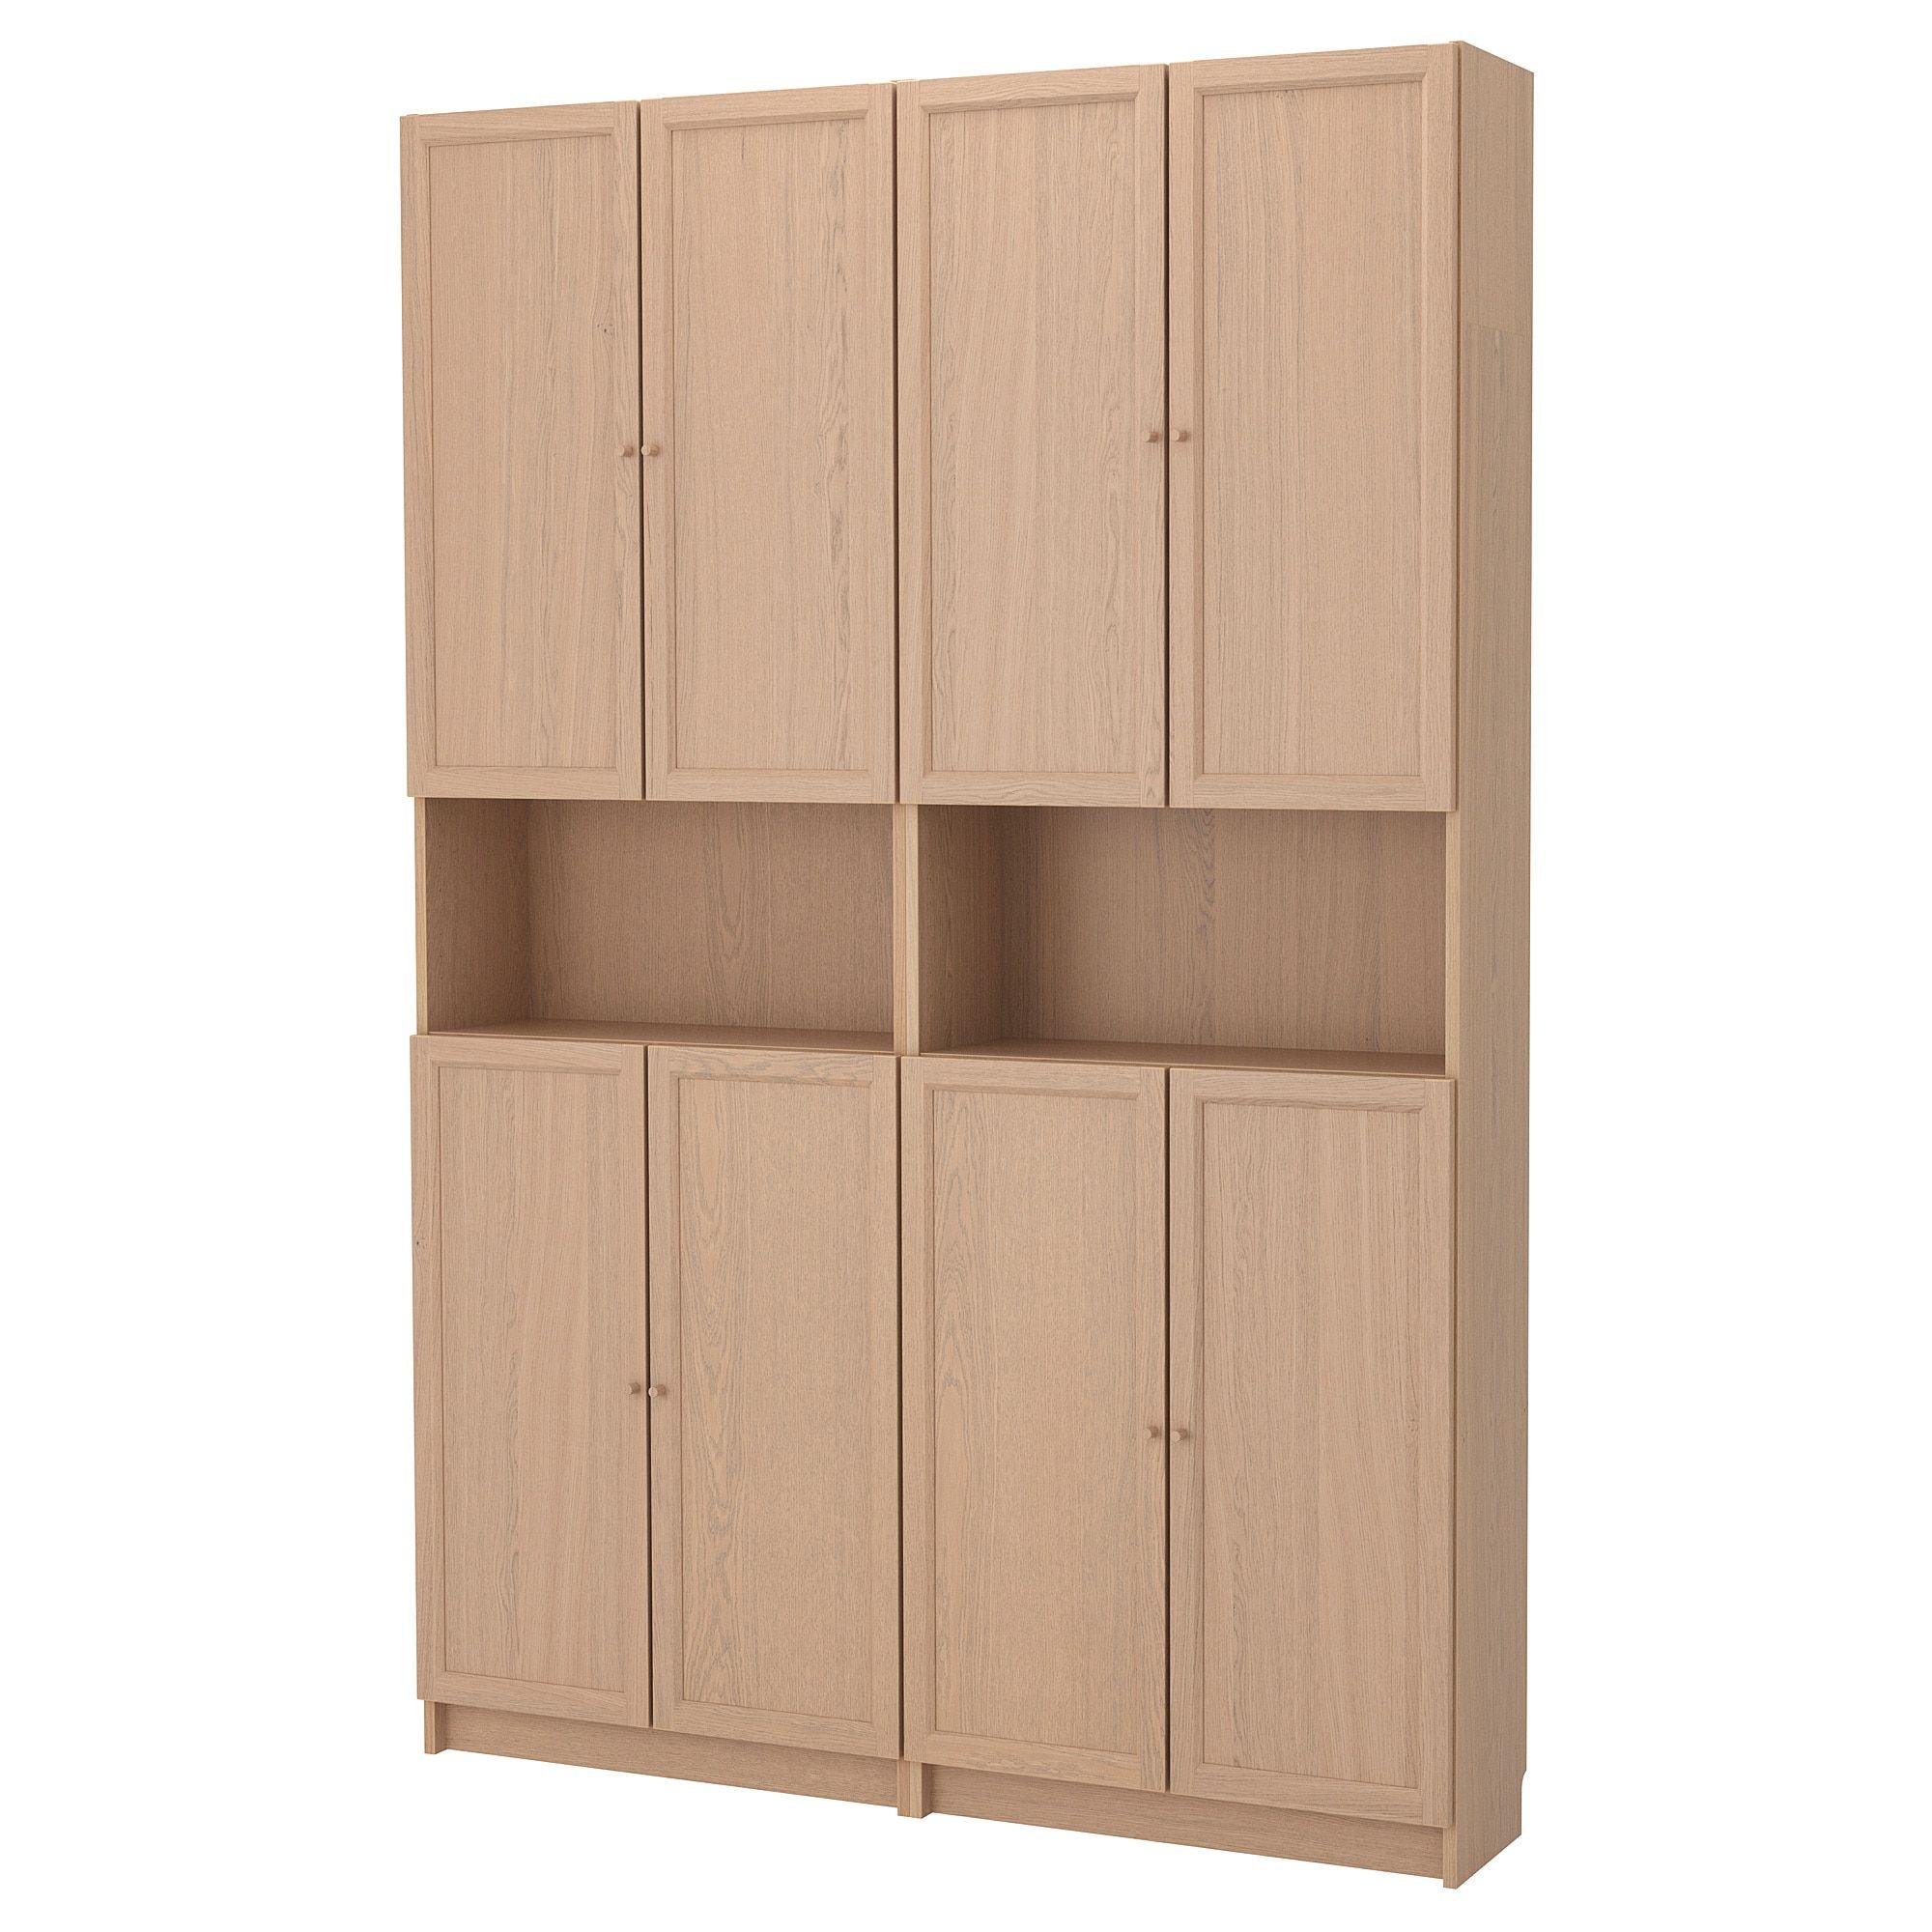 Ikea Billy Oxberg Doors With Height Extension Unit Doors Can Be Placed Wherever Billy Oxberg Billy Bucherregal Bucherregal